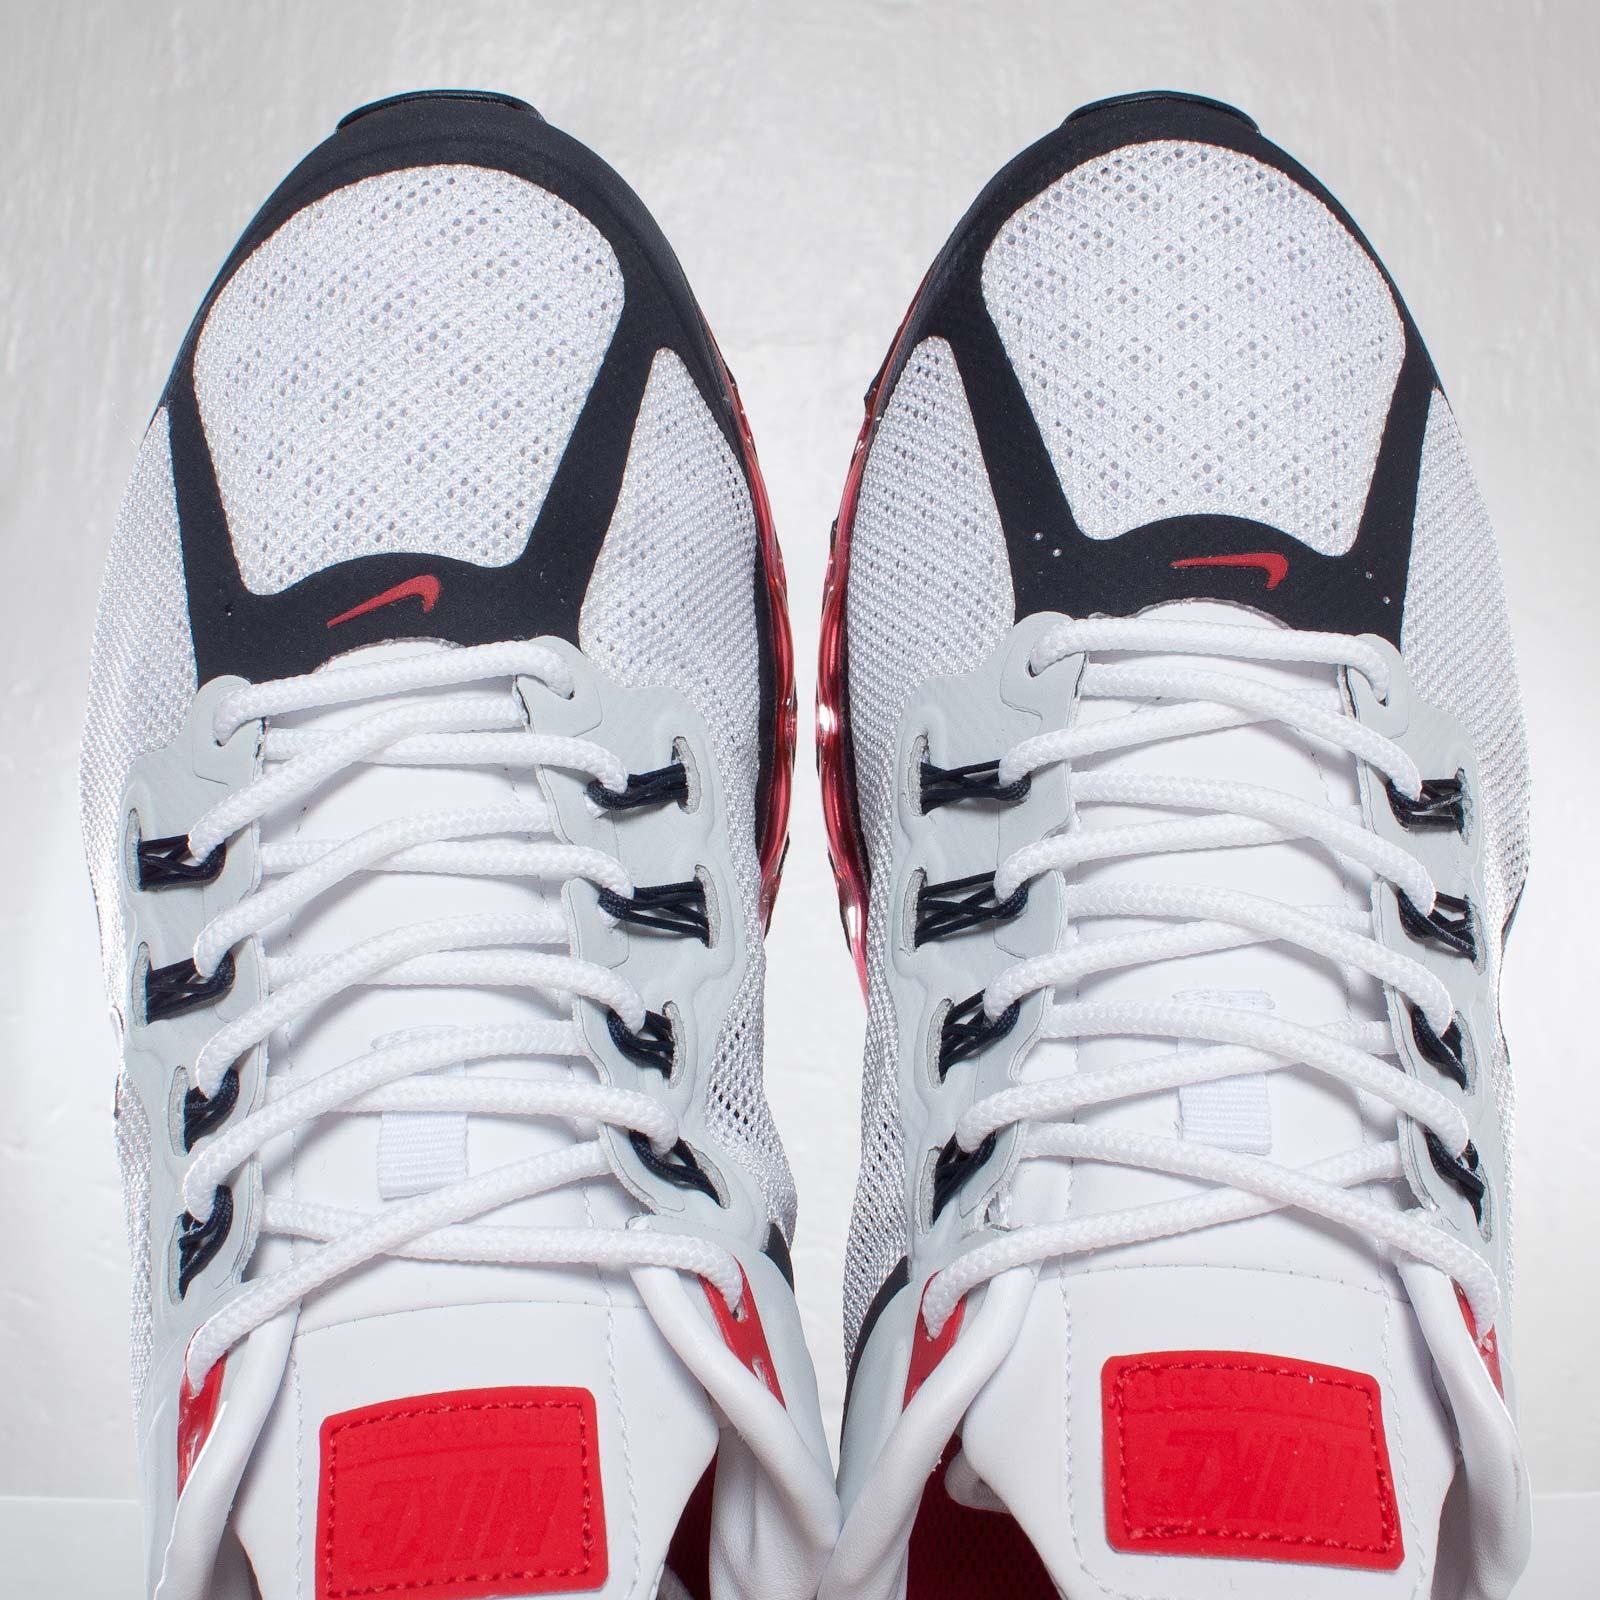 detailed look c2a76 d1594 Nike Air Max 2013 EXT - 554967-146 - Sneakersnstuff   sneakers   streetwear  online since 1999